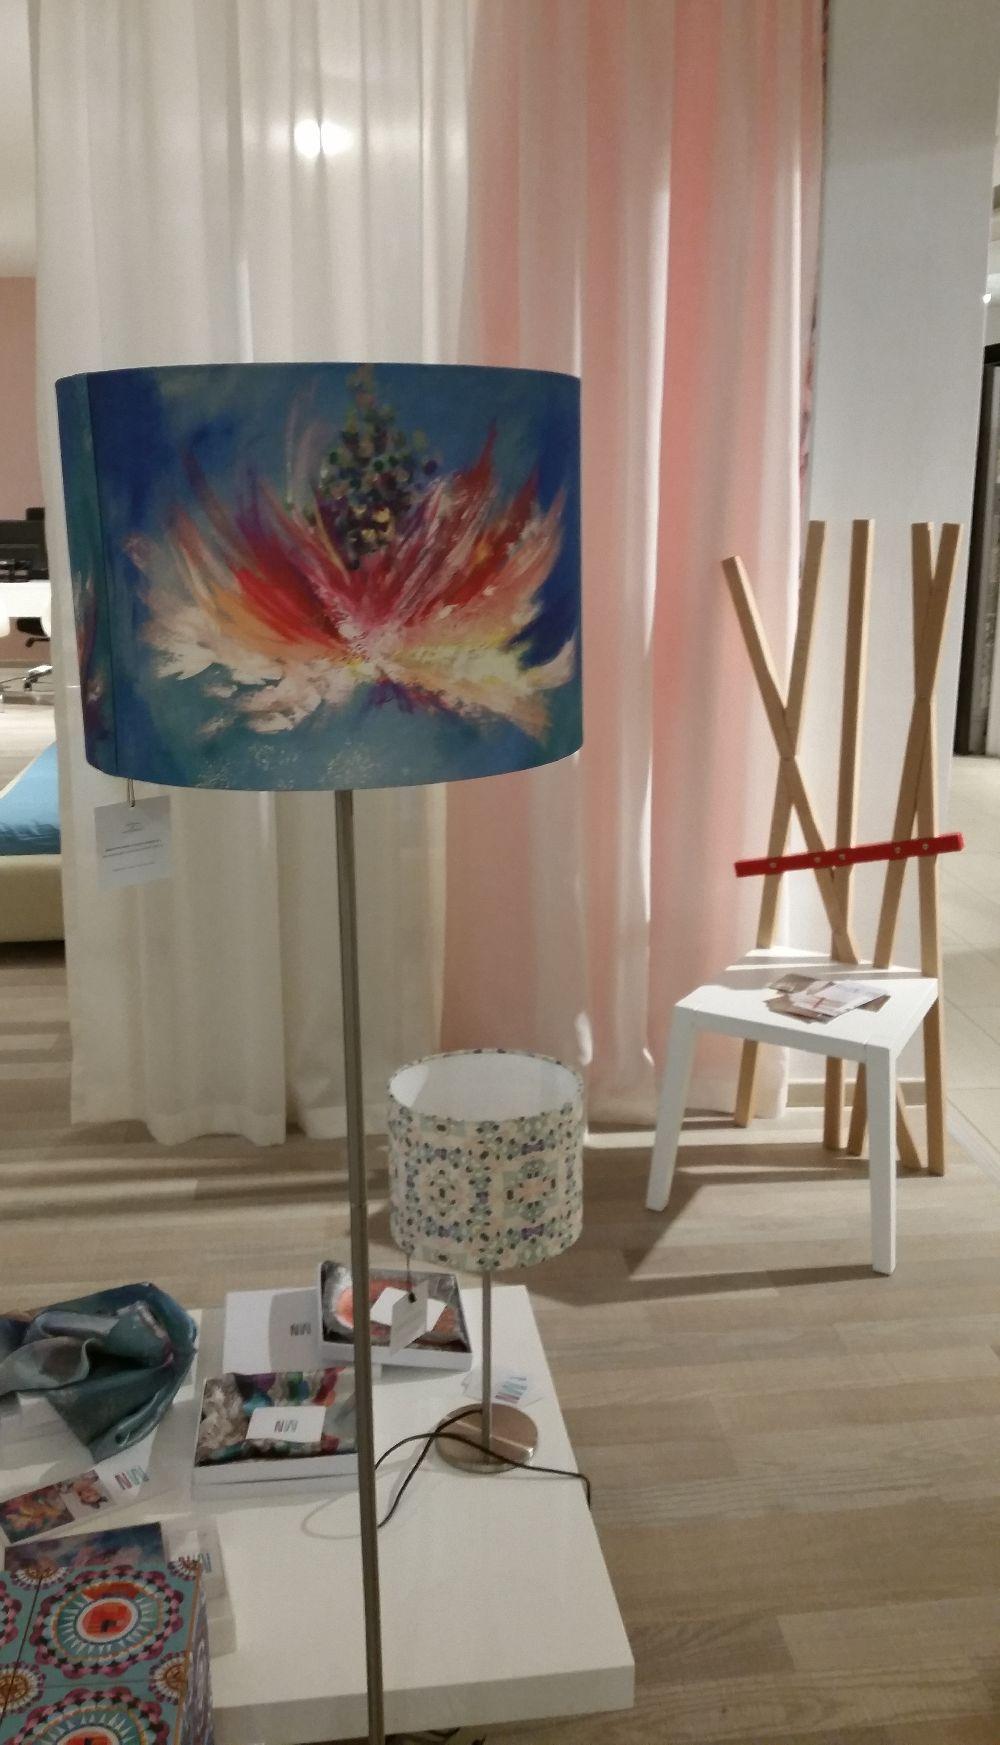 adelaparvu.com despre Delta Design Expo 2015, colectie Marie Nouvelle, designer Maria Dermengiu 5